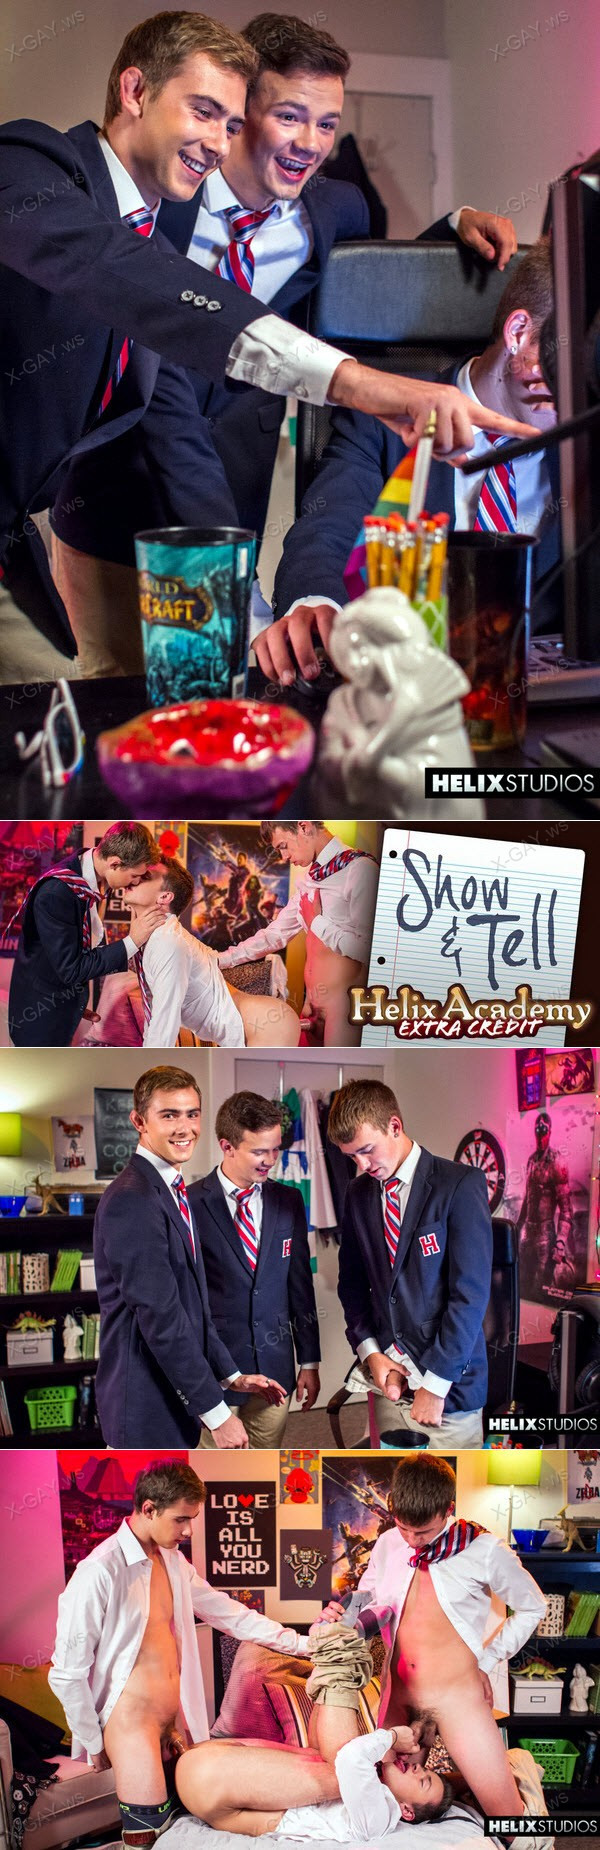 HelixStudios: Helix Academy Extra Credit: Show & Tell (Kody Knight, Troy Ryan, Logan Cross)